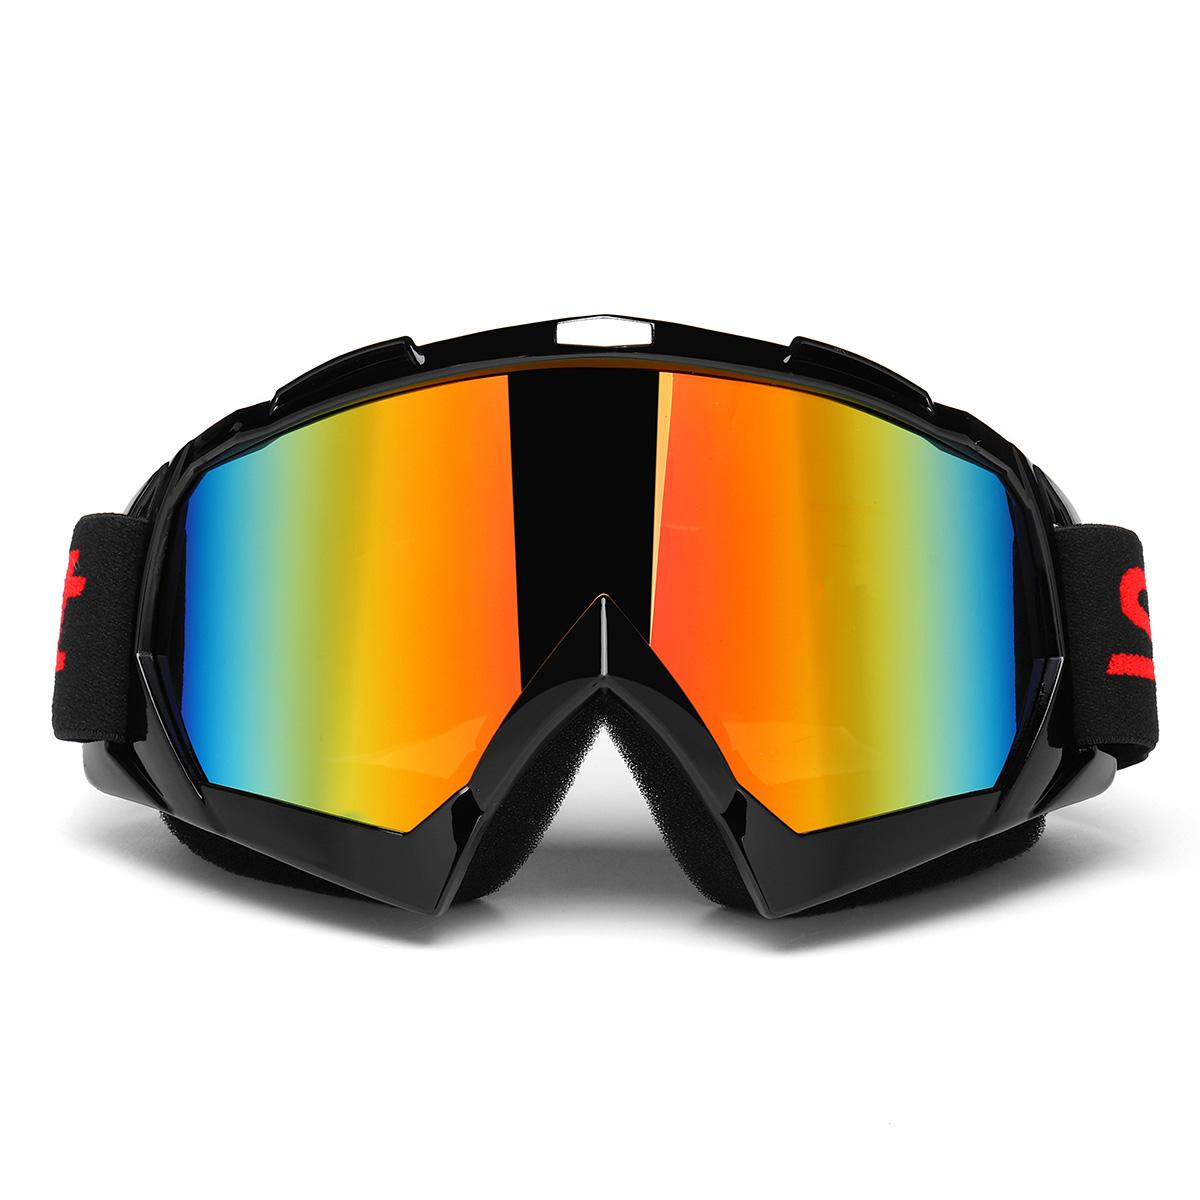 Double Lens Anti-fog Skiing Snowboarding Sun Snow Ski Goggles Motorcycle UV400